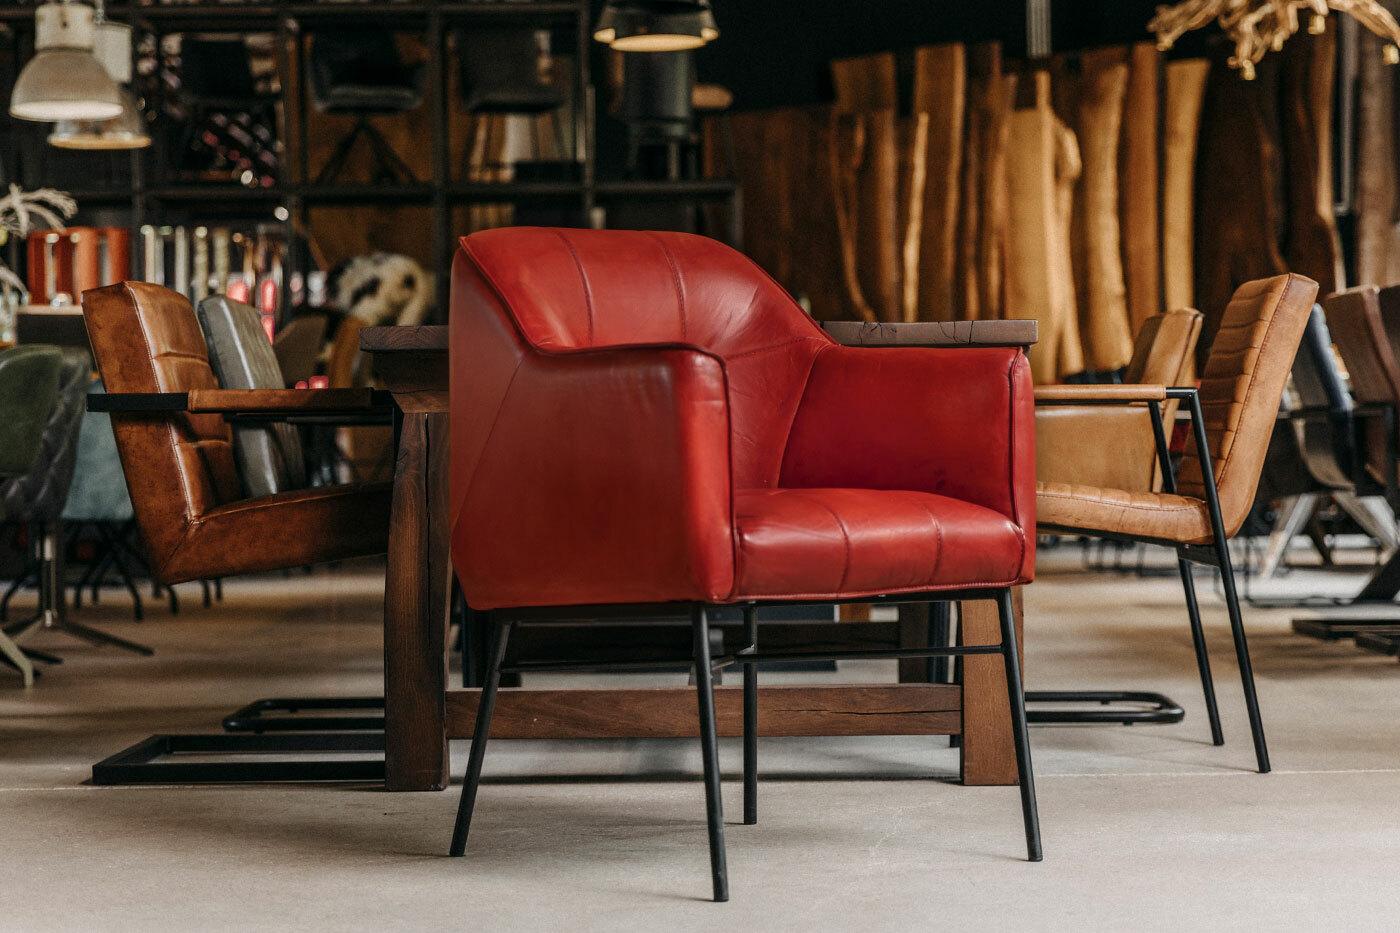 Vintage Stuhl mit Armlehne Leder